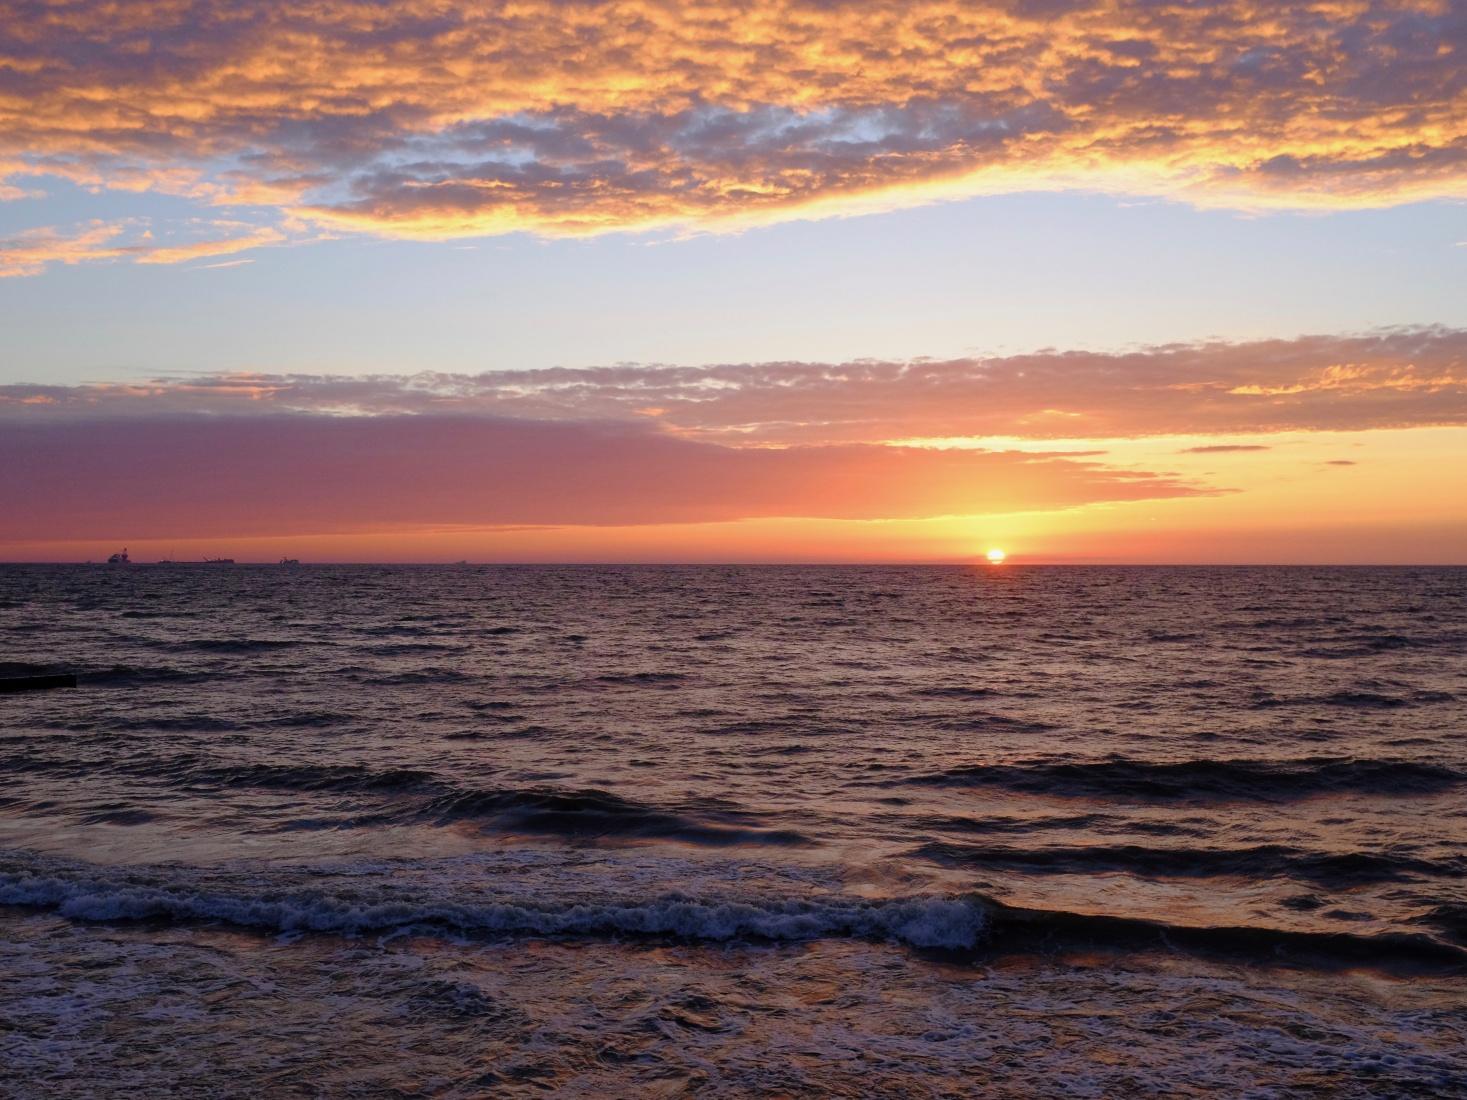 Sunset over the ocean in Zelenogradsk, near Kaliningrad, Russia.